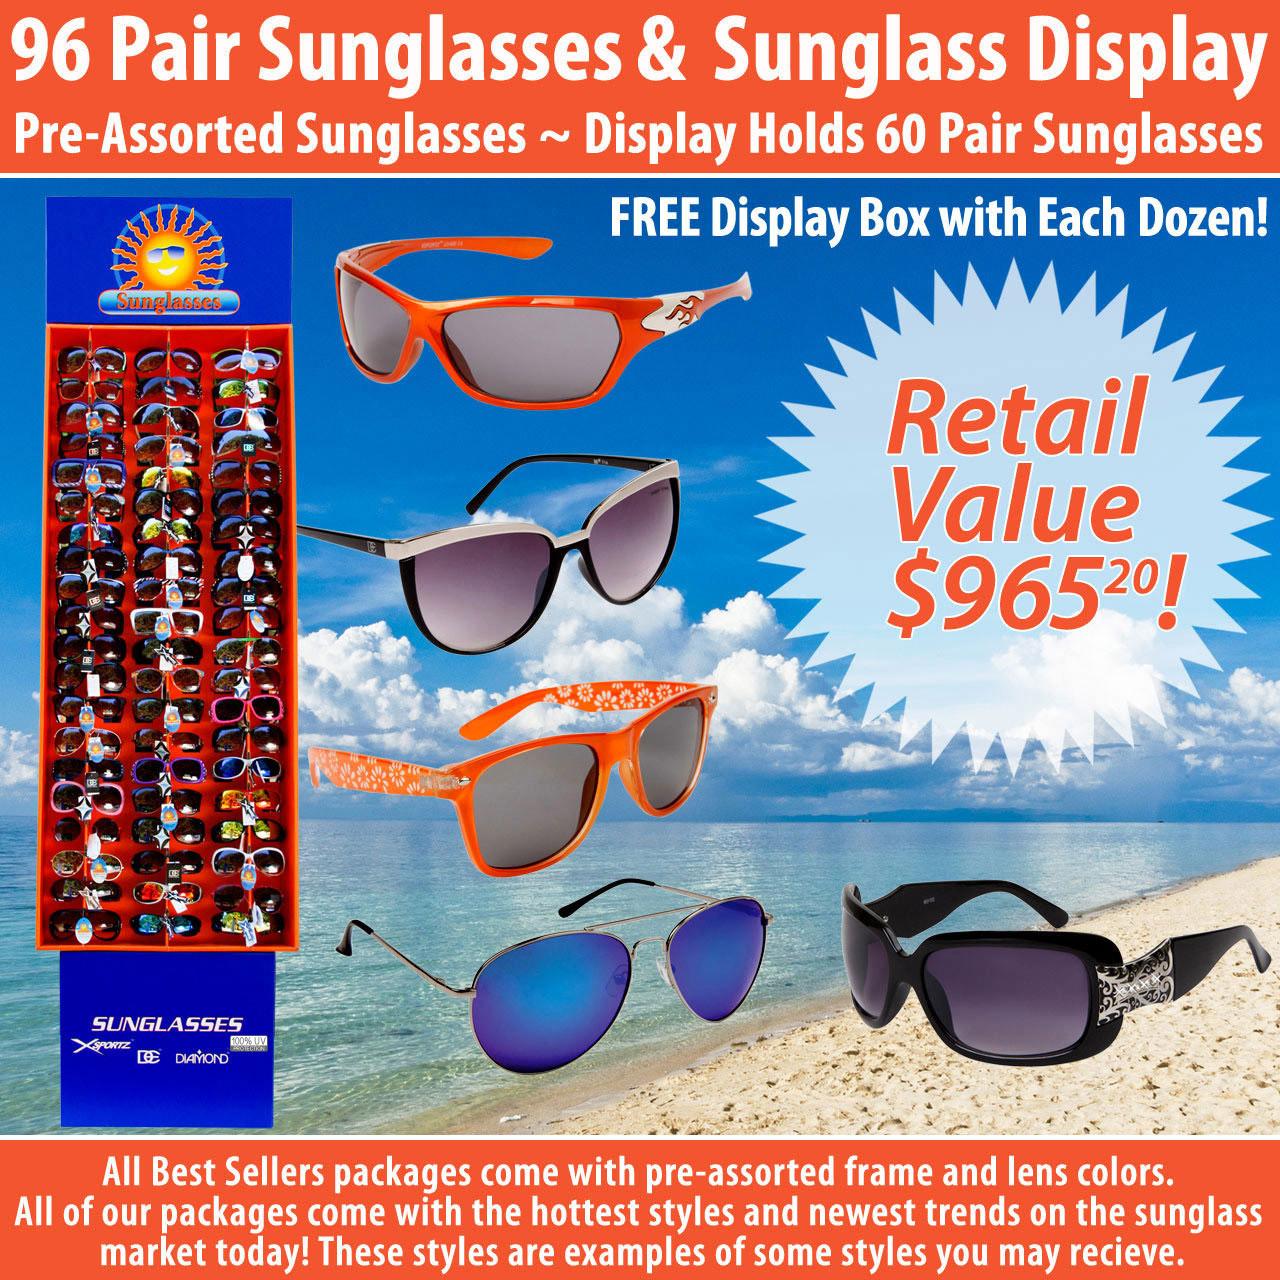 Package Deal SPA15 ~ 96 Pair Sunglasses & Display 7003 (96 pcs.) Display Holds 60 Pair